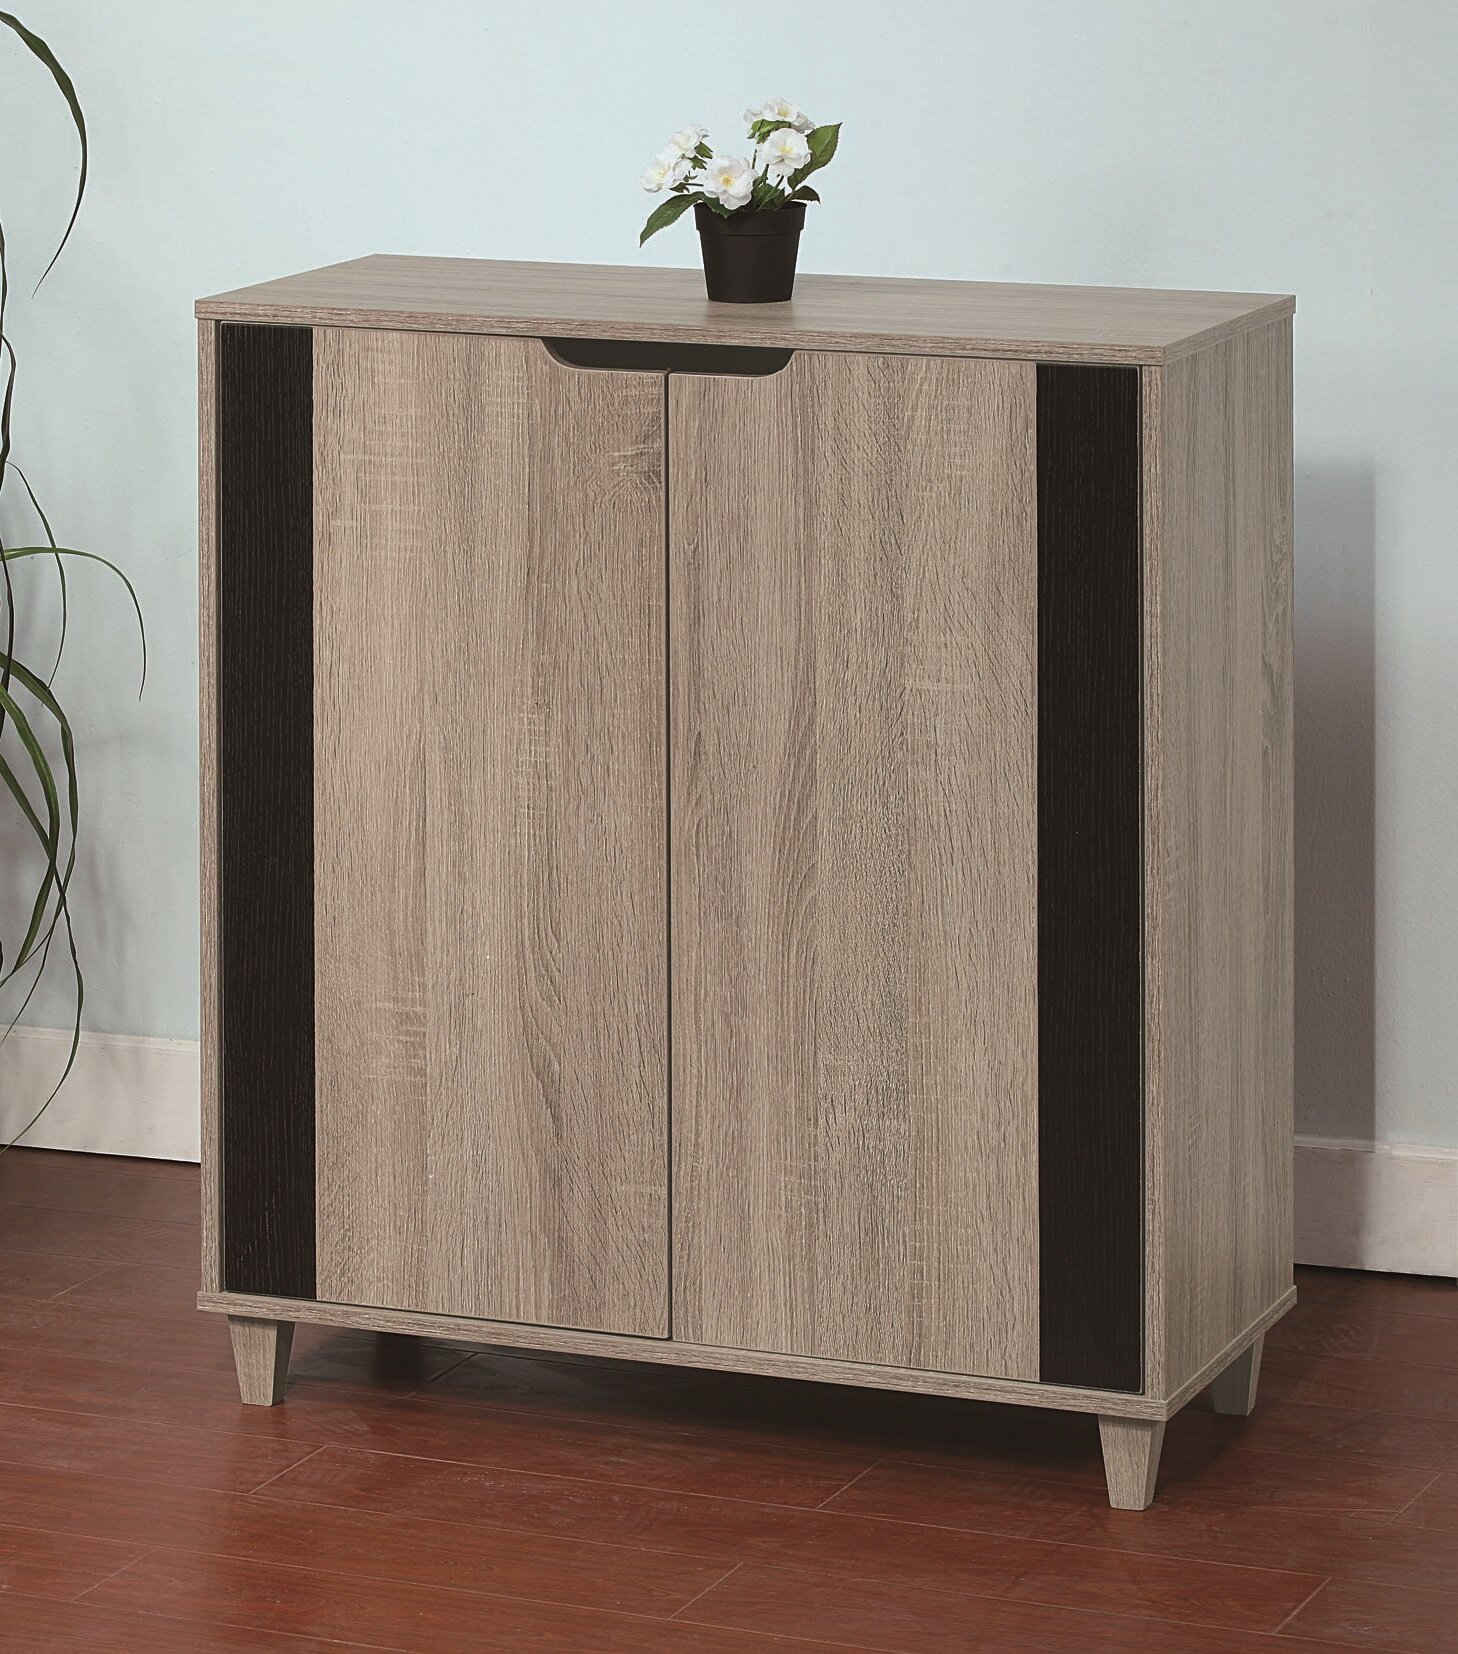 Latitude Run Wooden Entryway Shoe Storage Cabinet   Wayfair